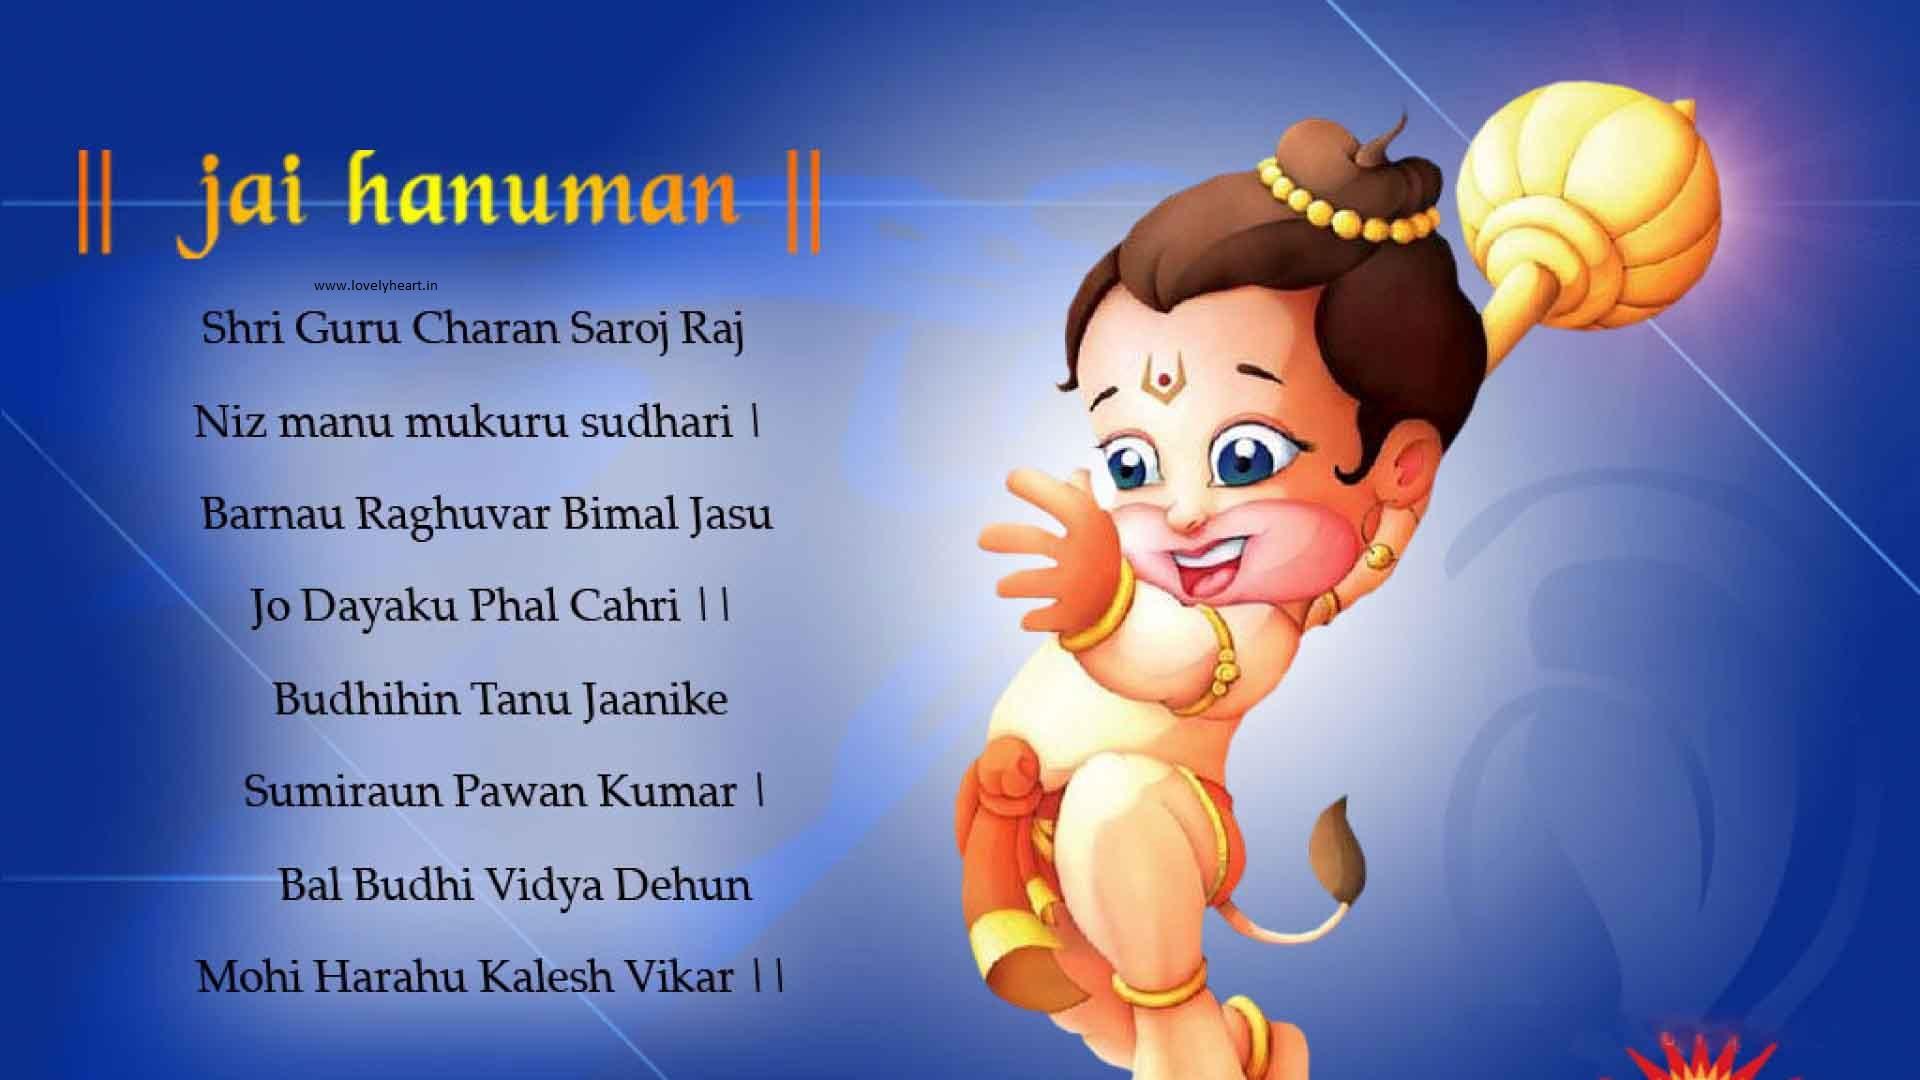 Hanuman Jayanti Hd Nice Wallpaperphoto 2015 Wwwlovelyheartin